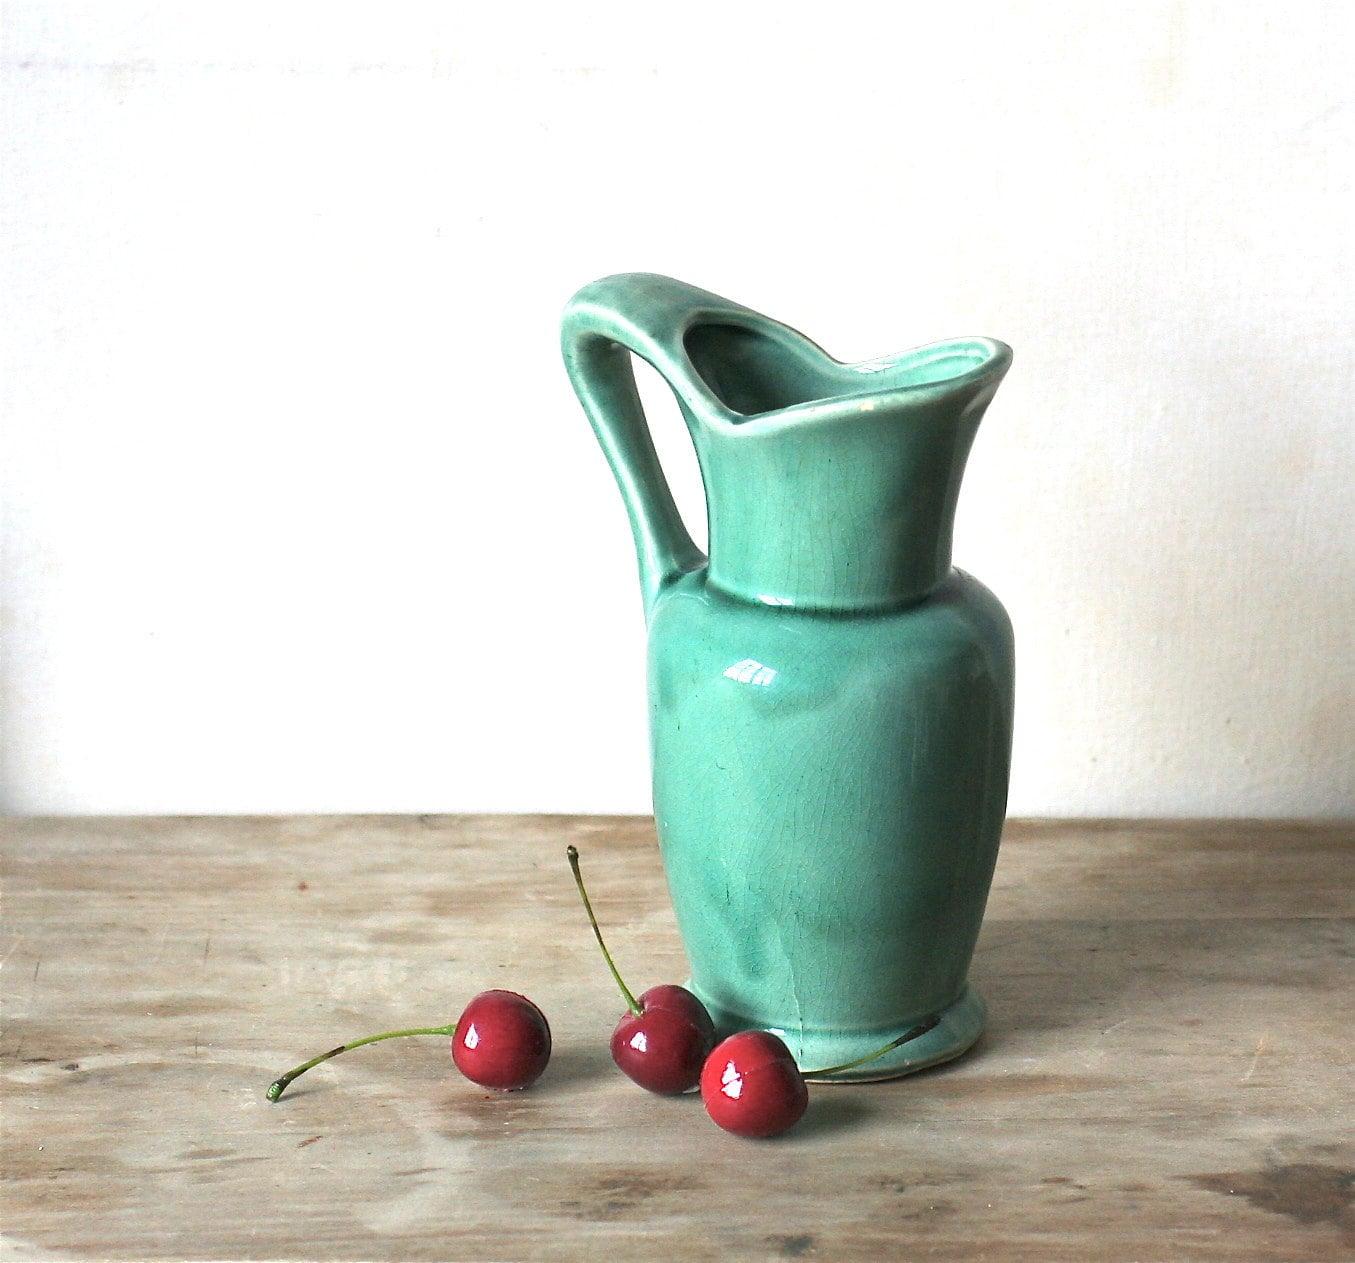 Vintage Ceramic Pitcher Vase Turquoise Glaze Craftsman - ivorybird